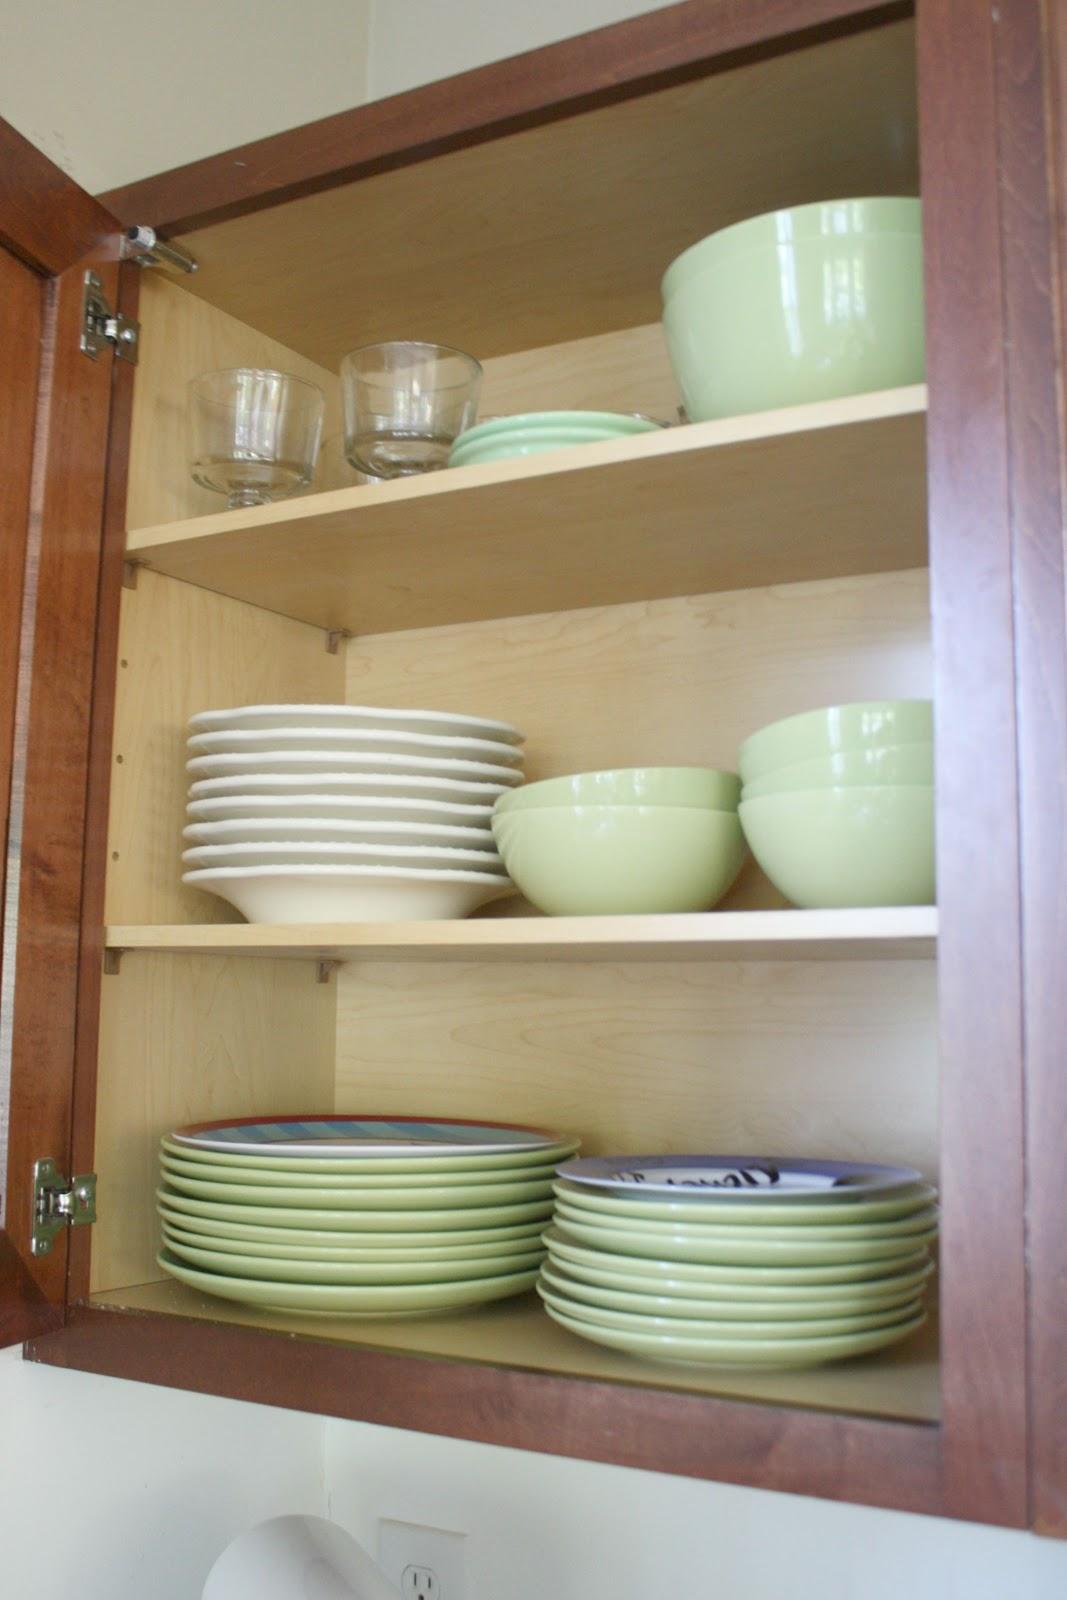 green ikea dishes